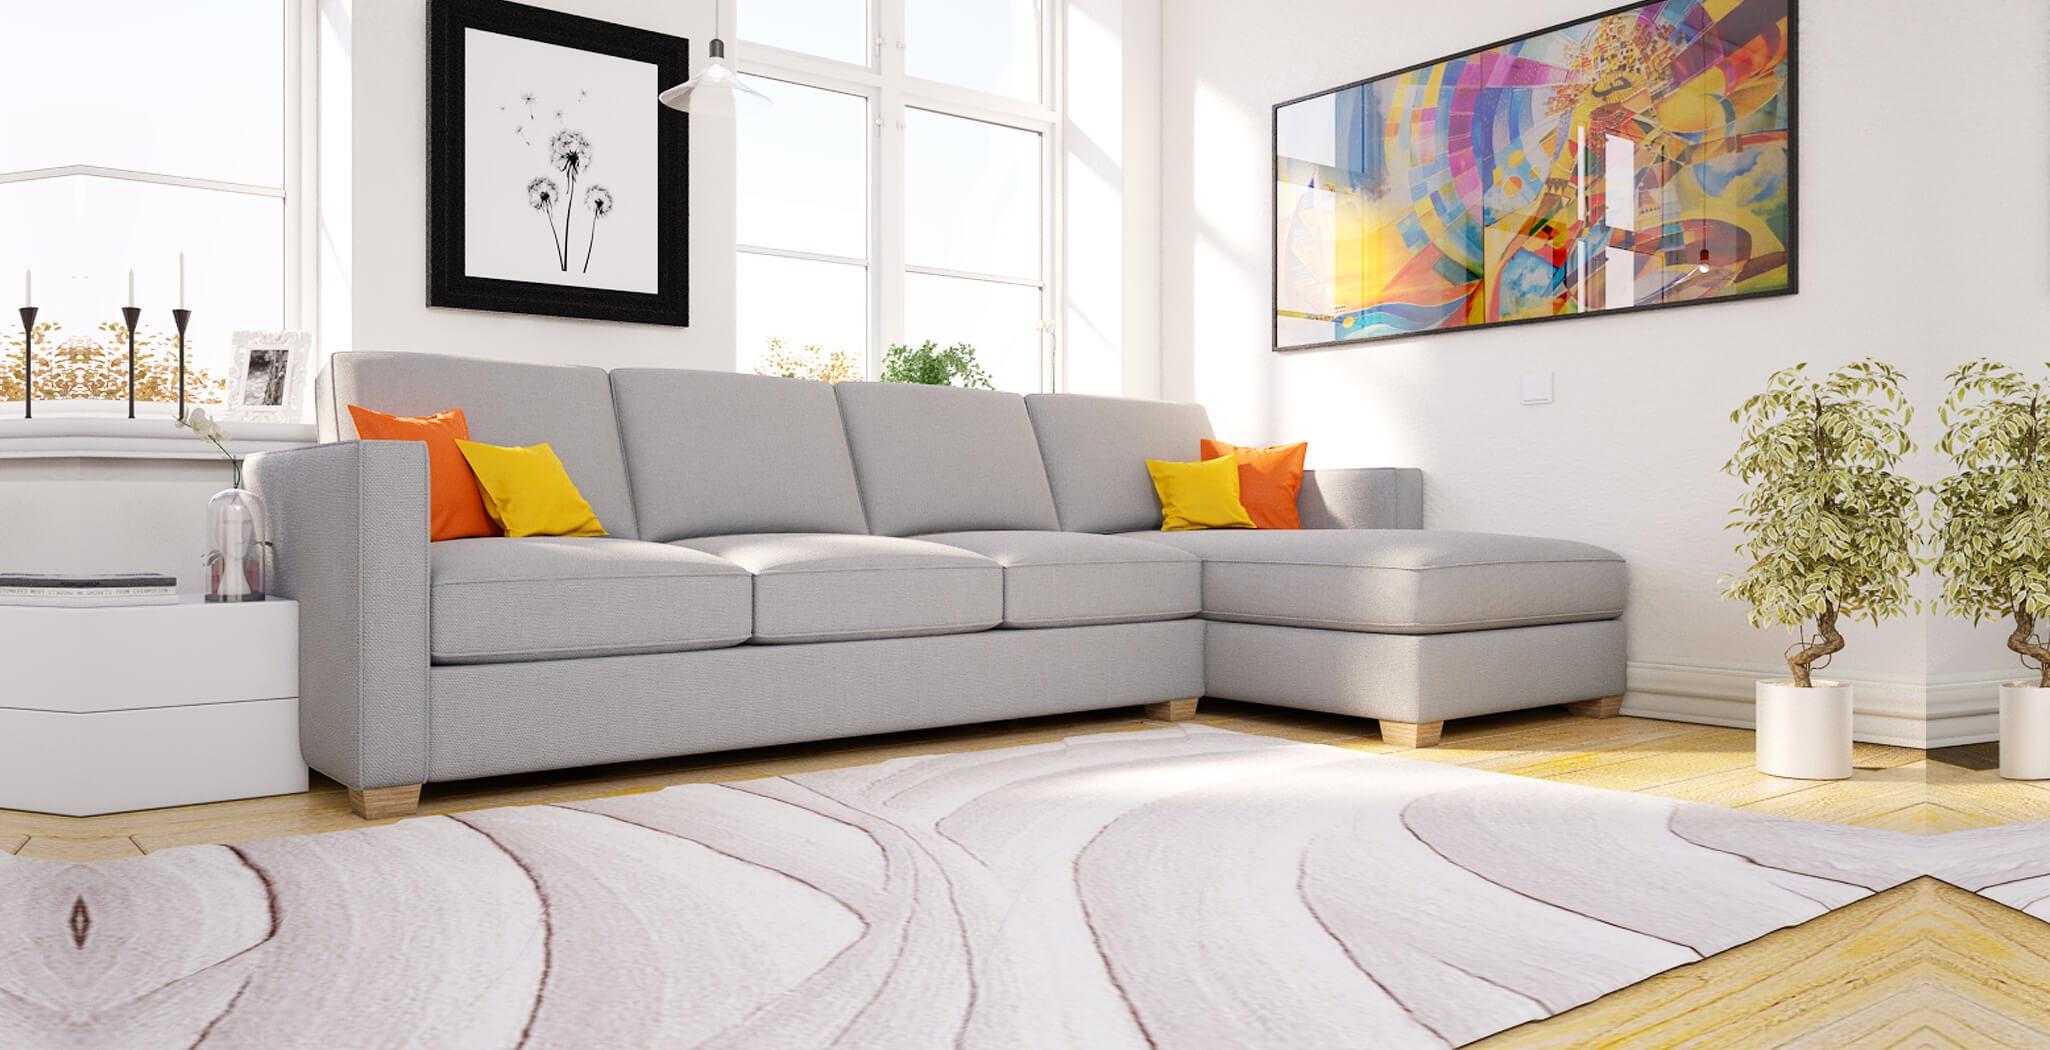 calgary panel furniture gallery 2